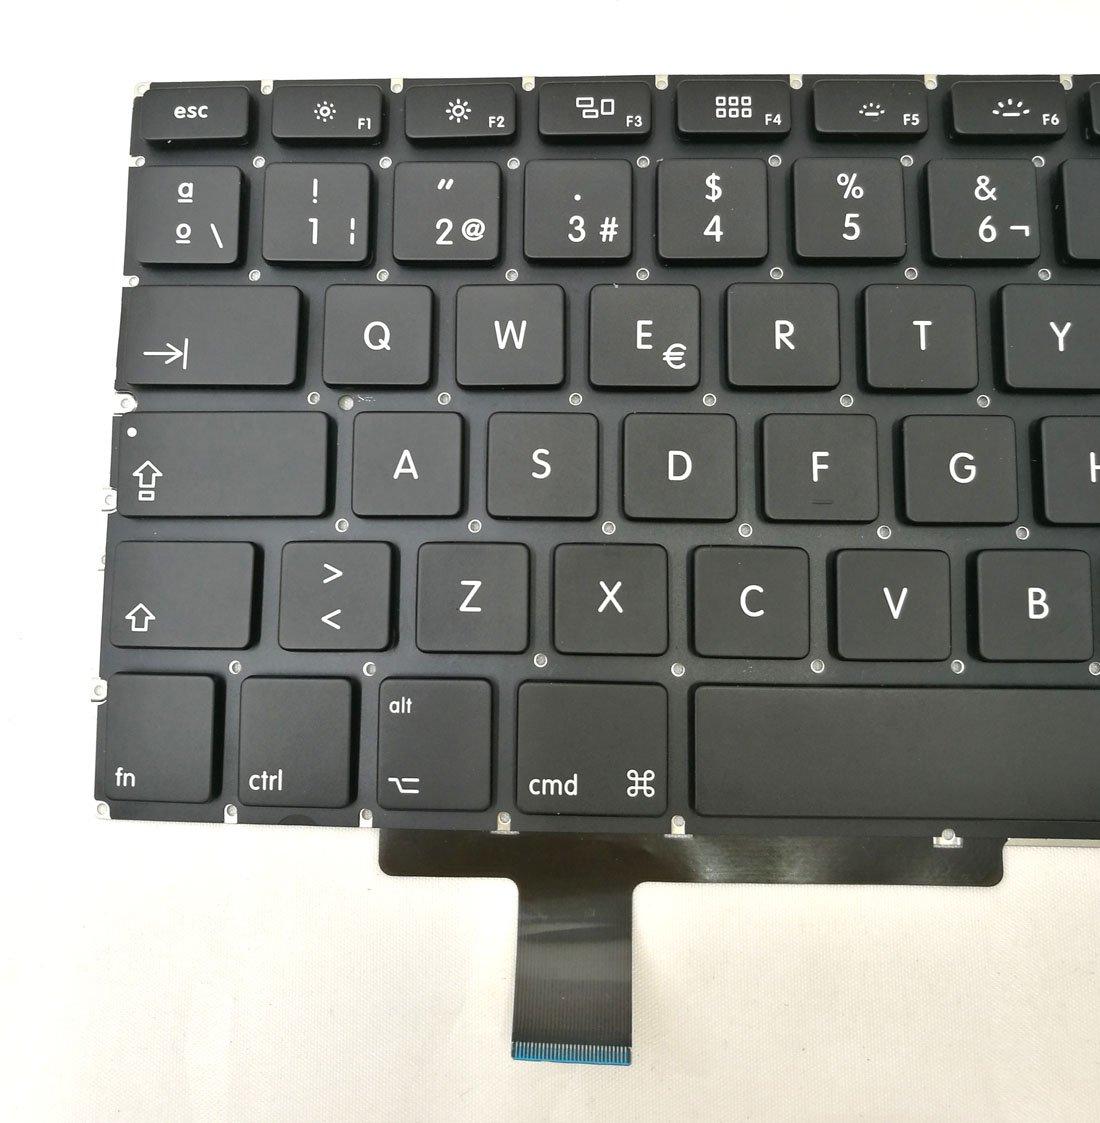 Amazon.com: Ittecc Spanish Teclado Keyboard ESPAÑOL Replacment Fit for MacBook Pro Unibody 17